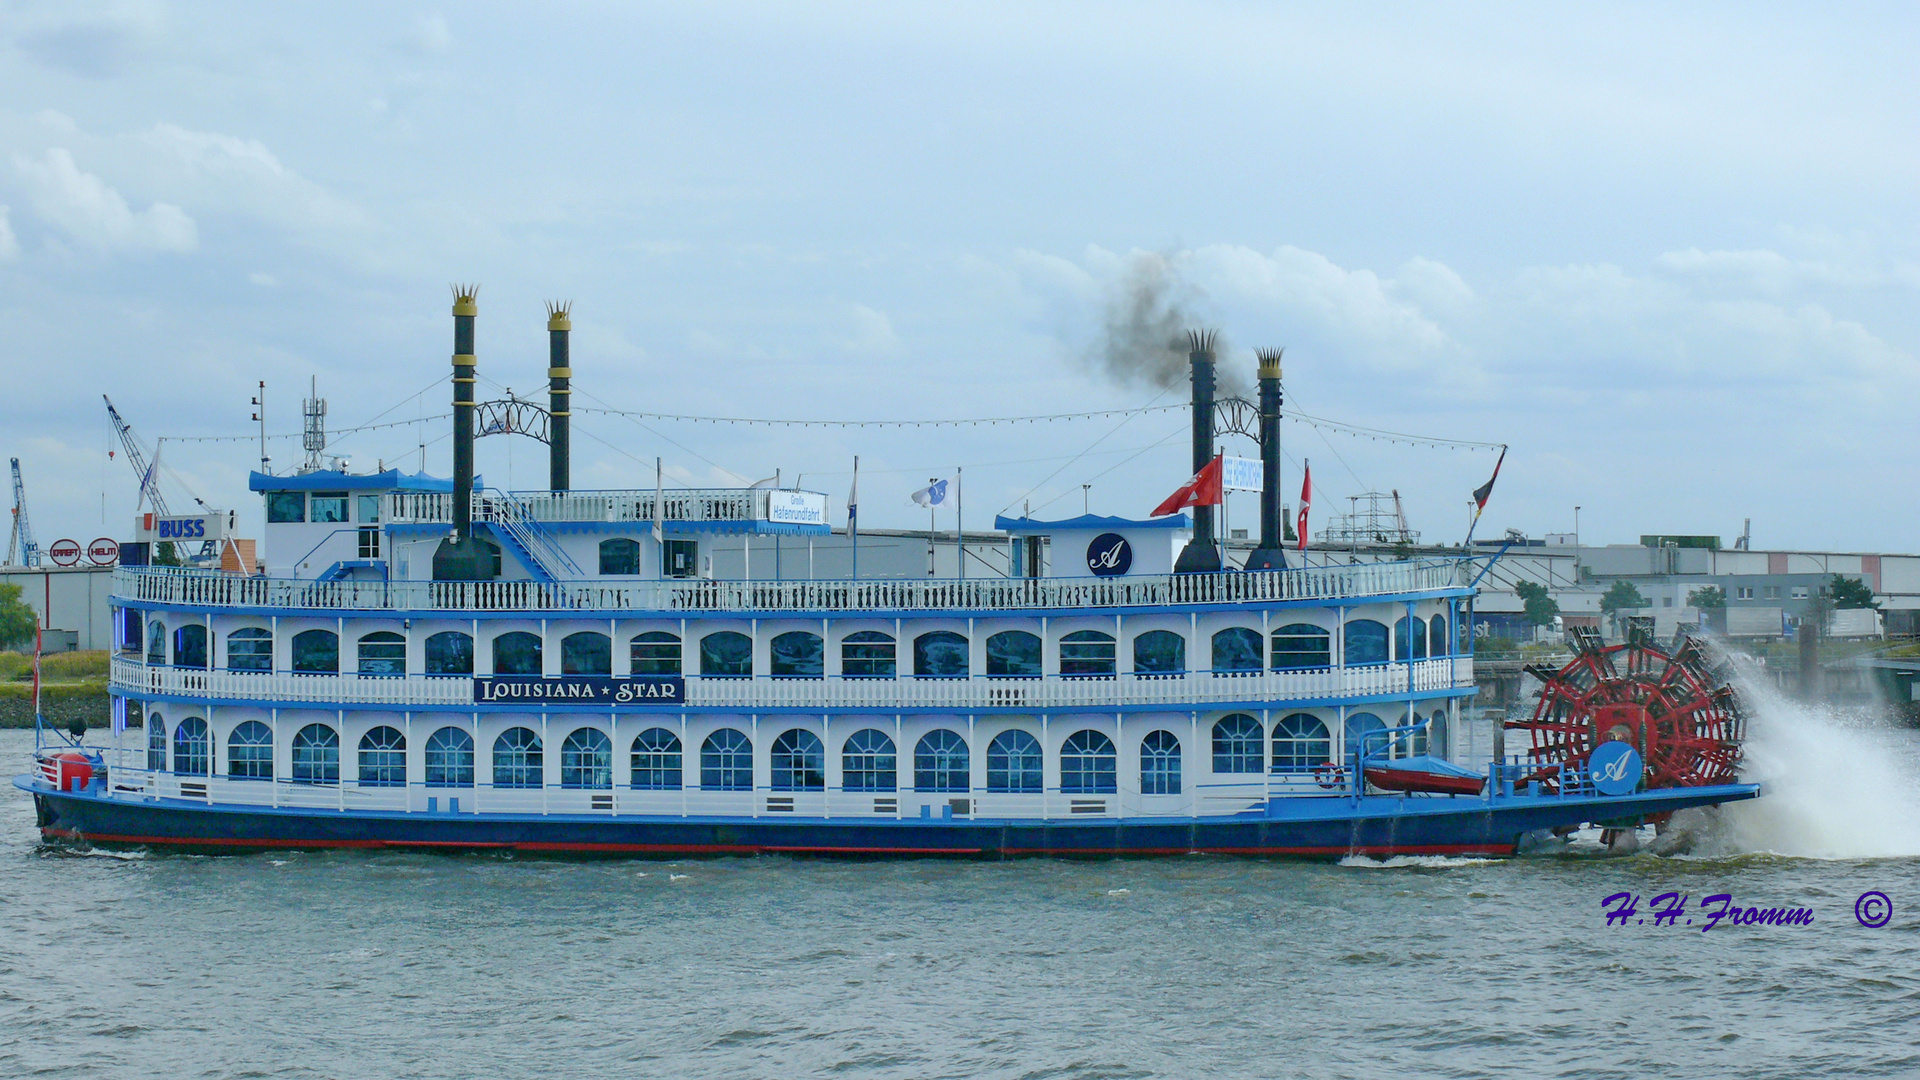 Louisiana Star - Hamburg Hafen